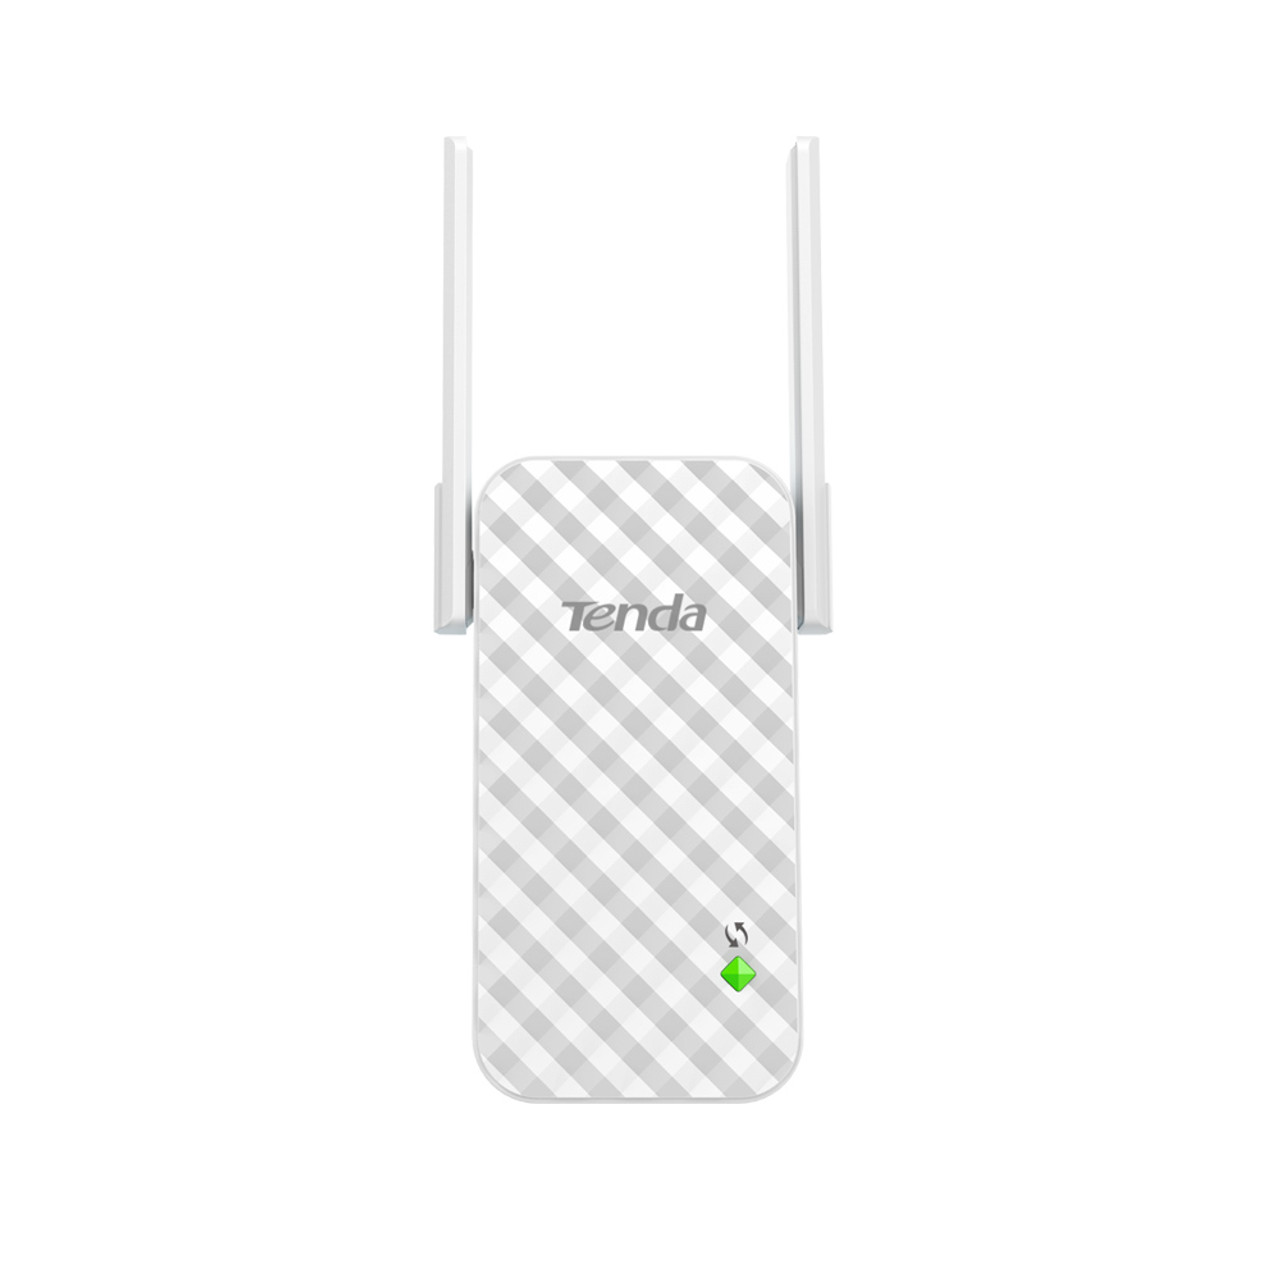 Tenda A9 N300 Wi-Fi Wall Plug Range Extender (A9)